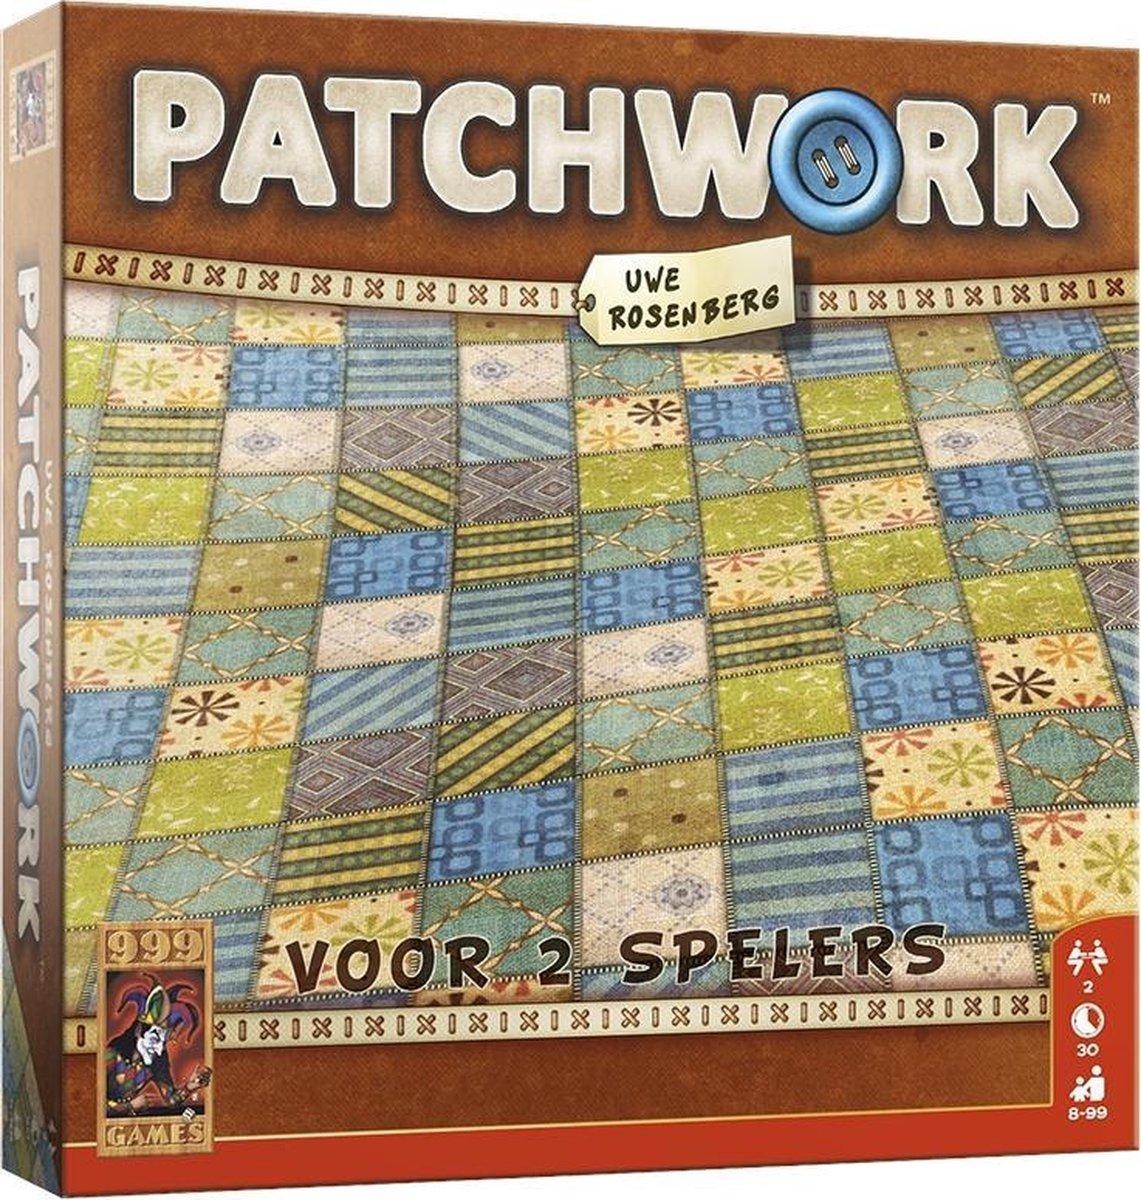 Patchwork - Gezelschapsspel - 999 Games